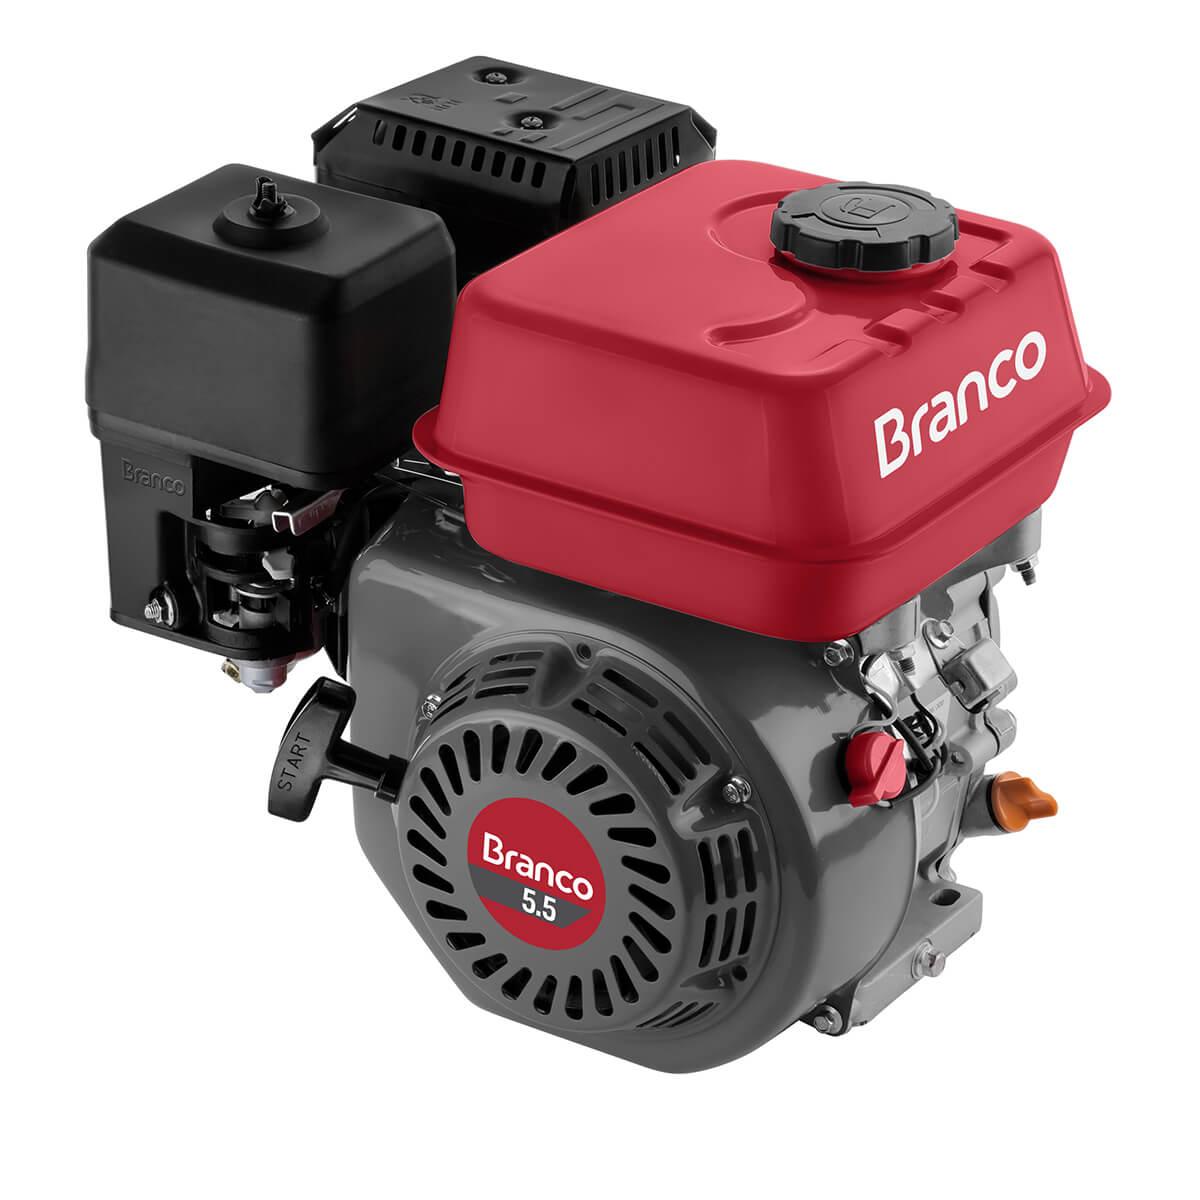 MOTOR BRANCO 5,5HP B4T SEM ALERTA DE OLEO - 90313430